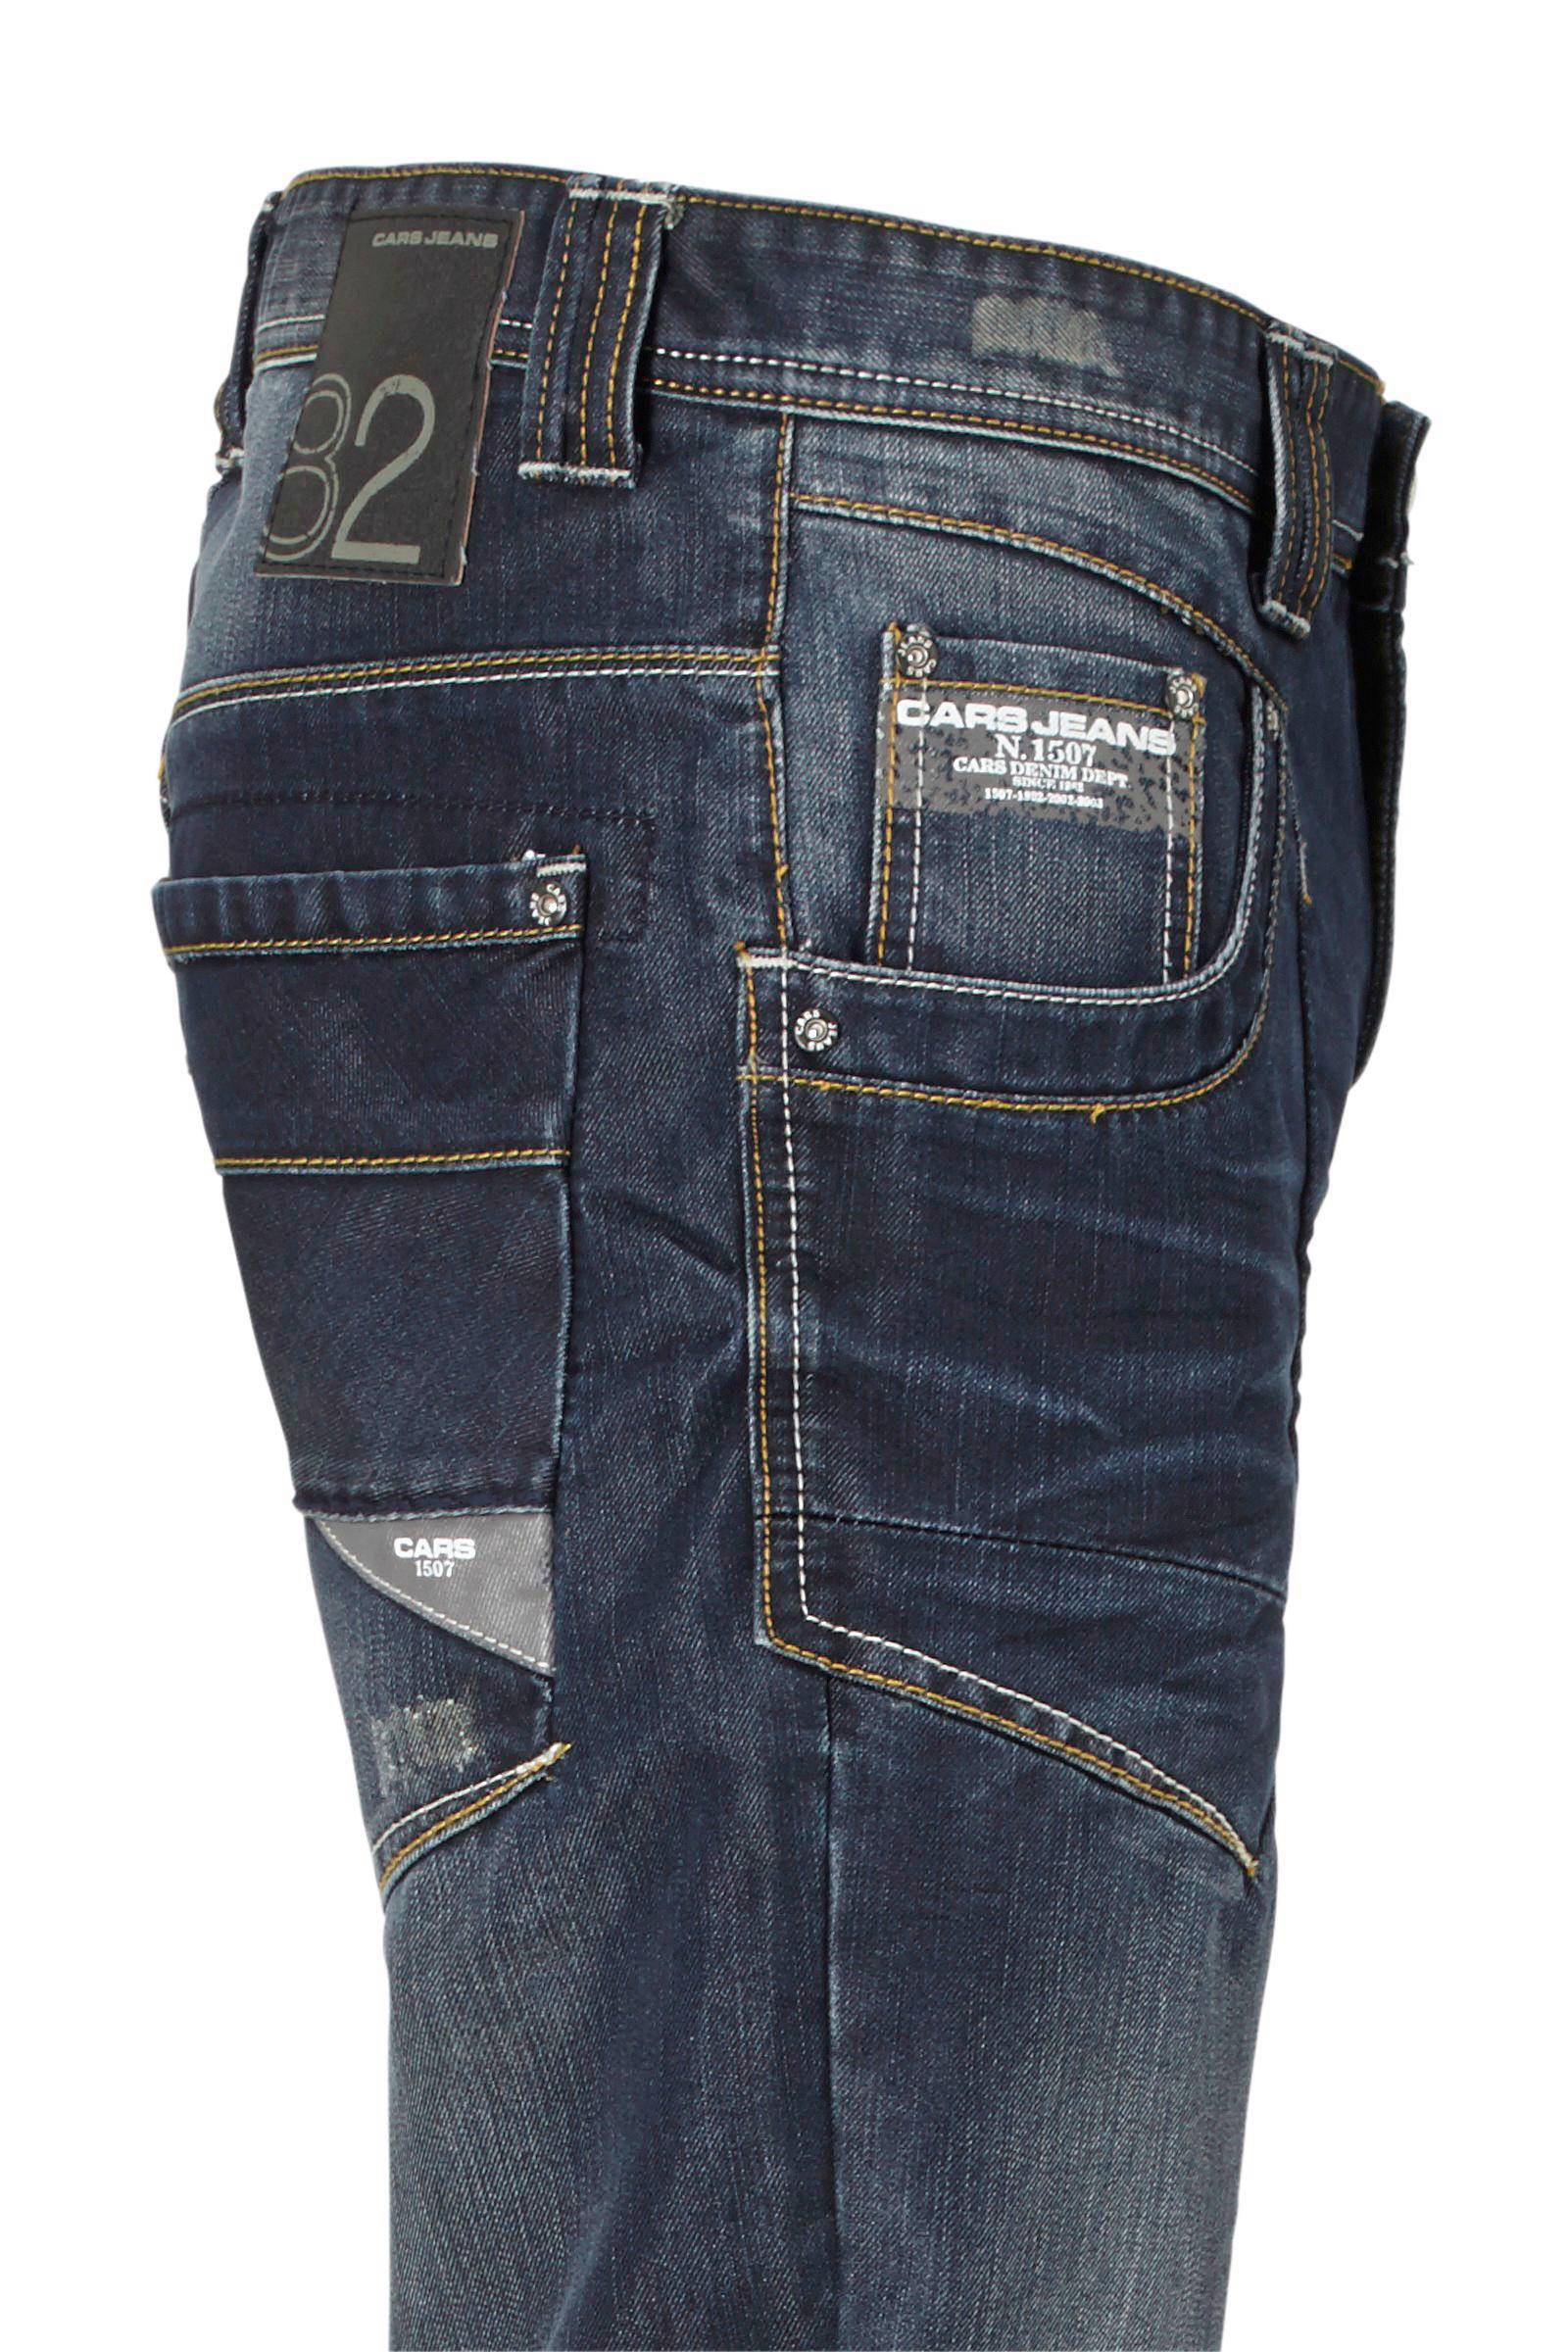 7834ea9bb8b Cars regular fit jeans Bedford | wehkamp